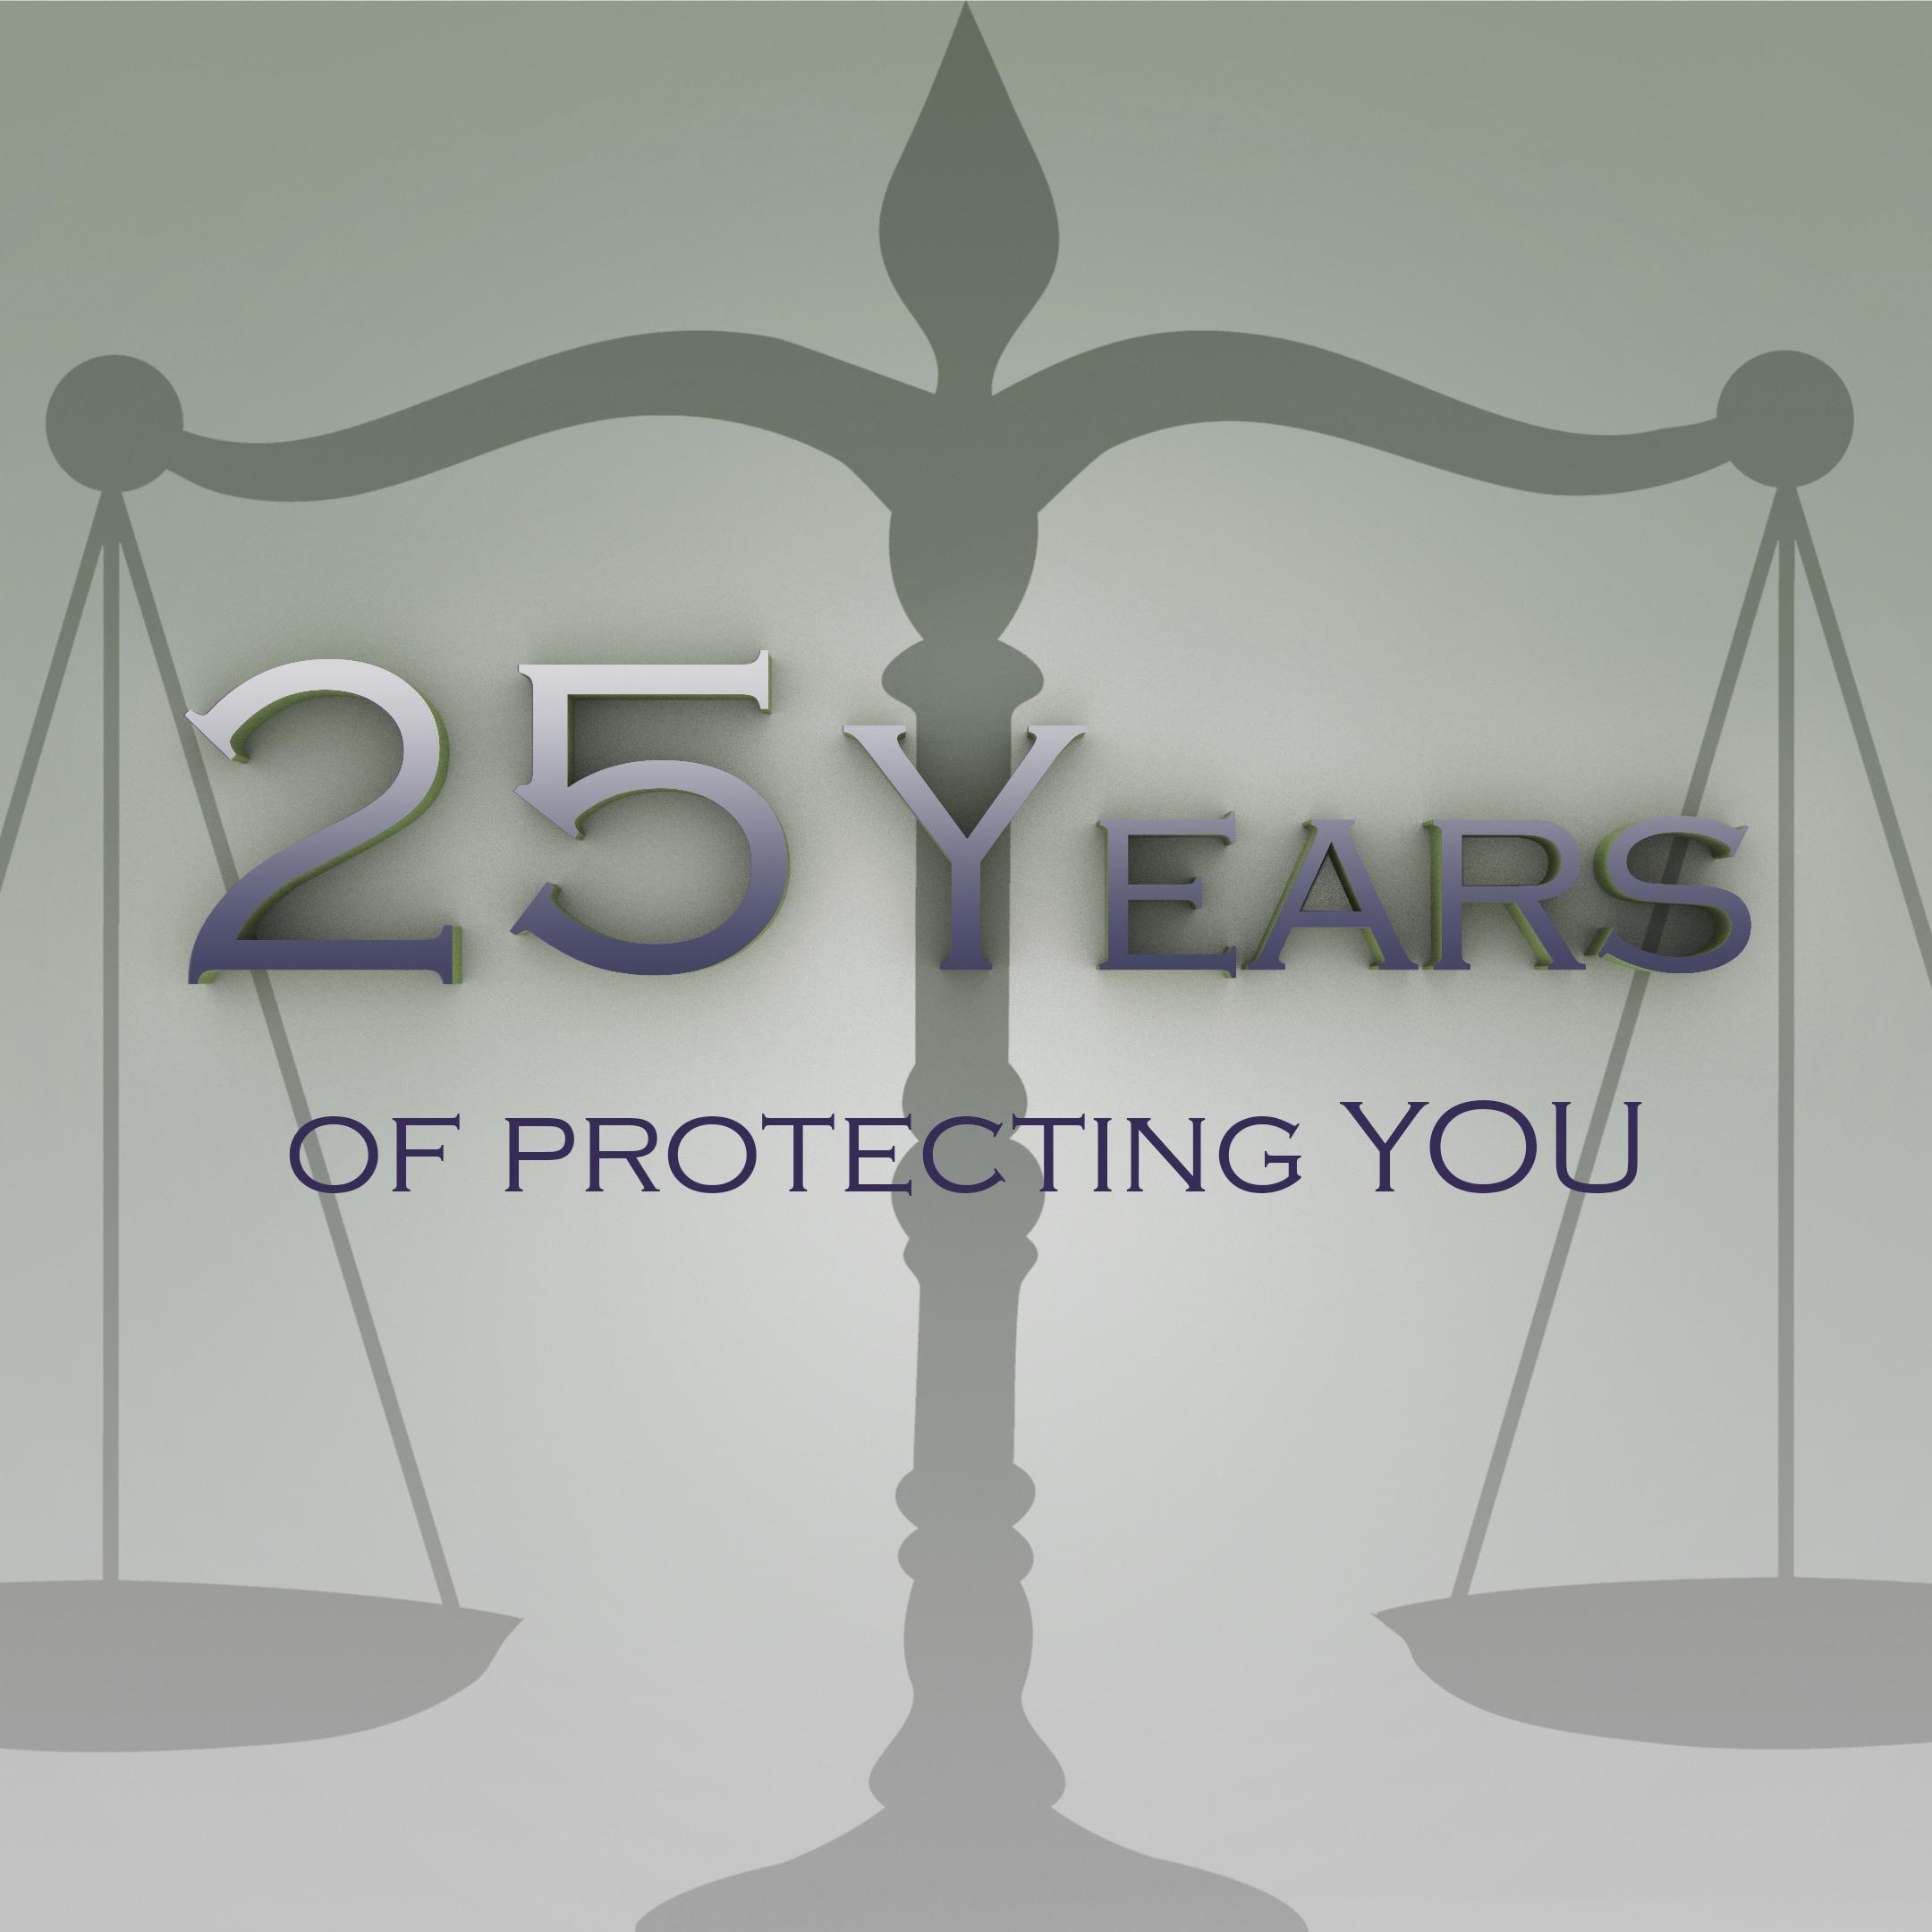 Attorney Las Vegas . com | Jacqueline Mary McQuigg & Assoc - Las Vegas, NV - Attorneys